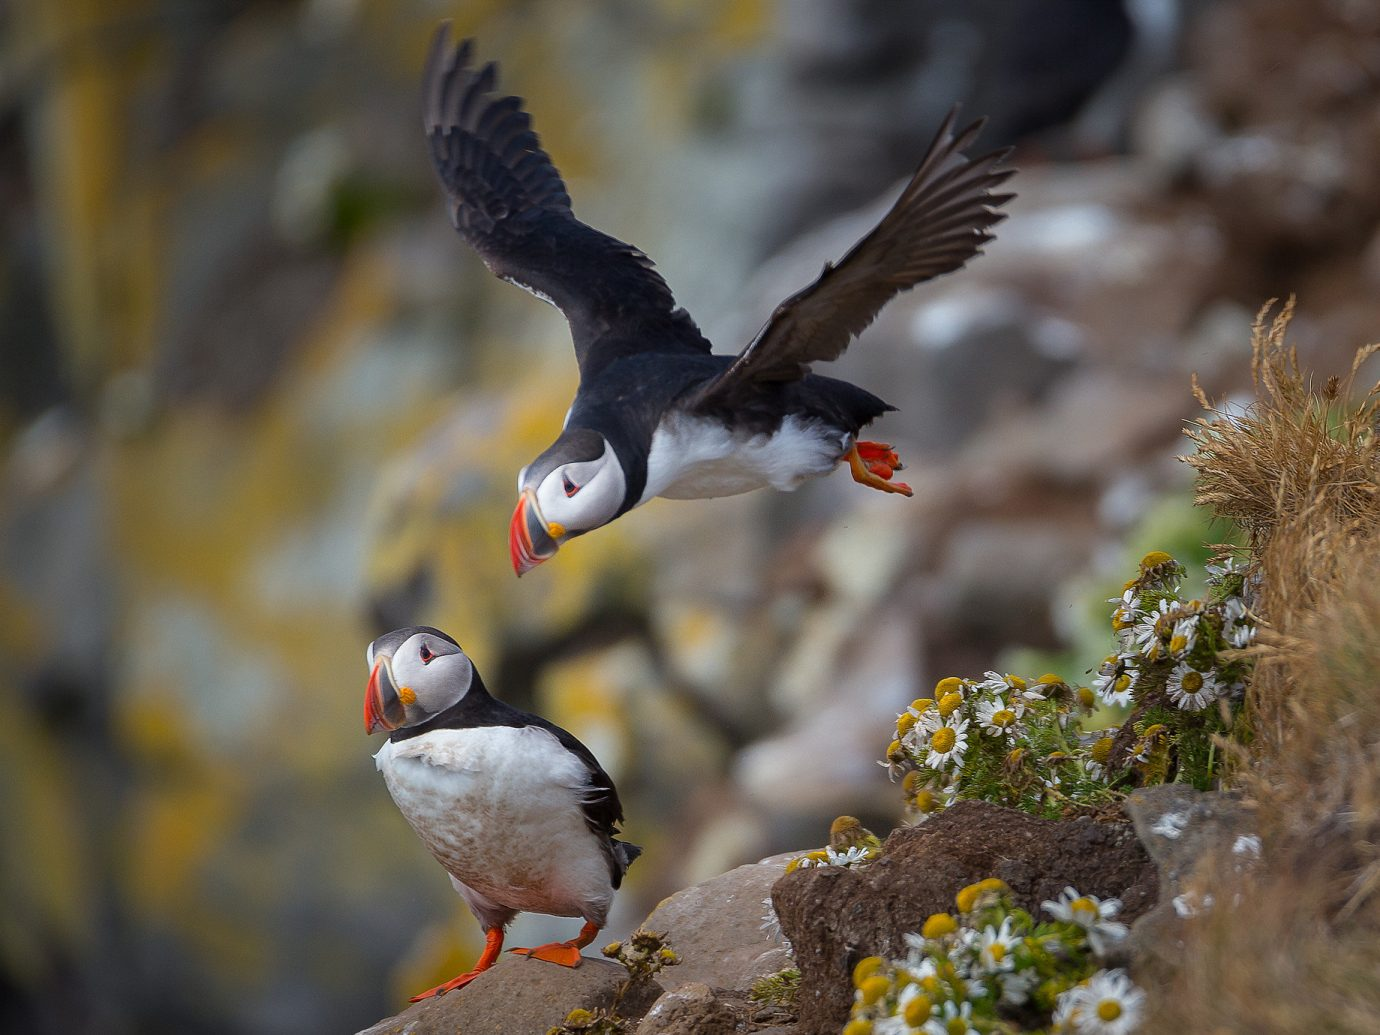 Trip Ideas Bird animal outdoor Nature beak vertebrate puffin Wildlife fauna colorful charadriiformes falcon seabird orange colored